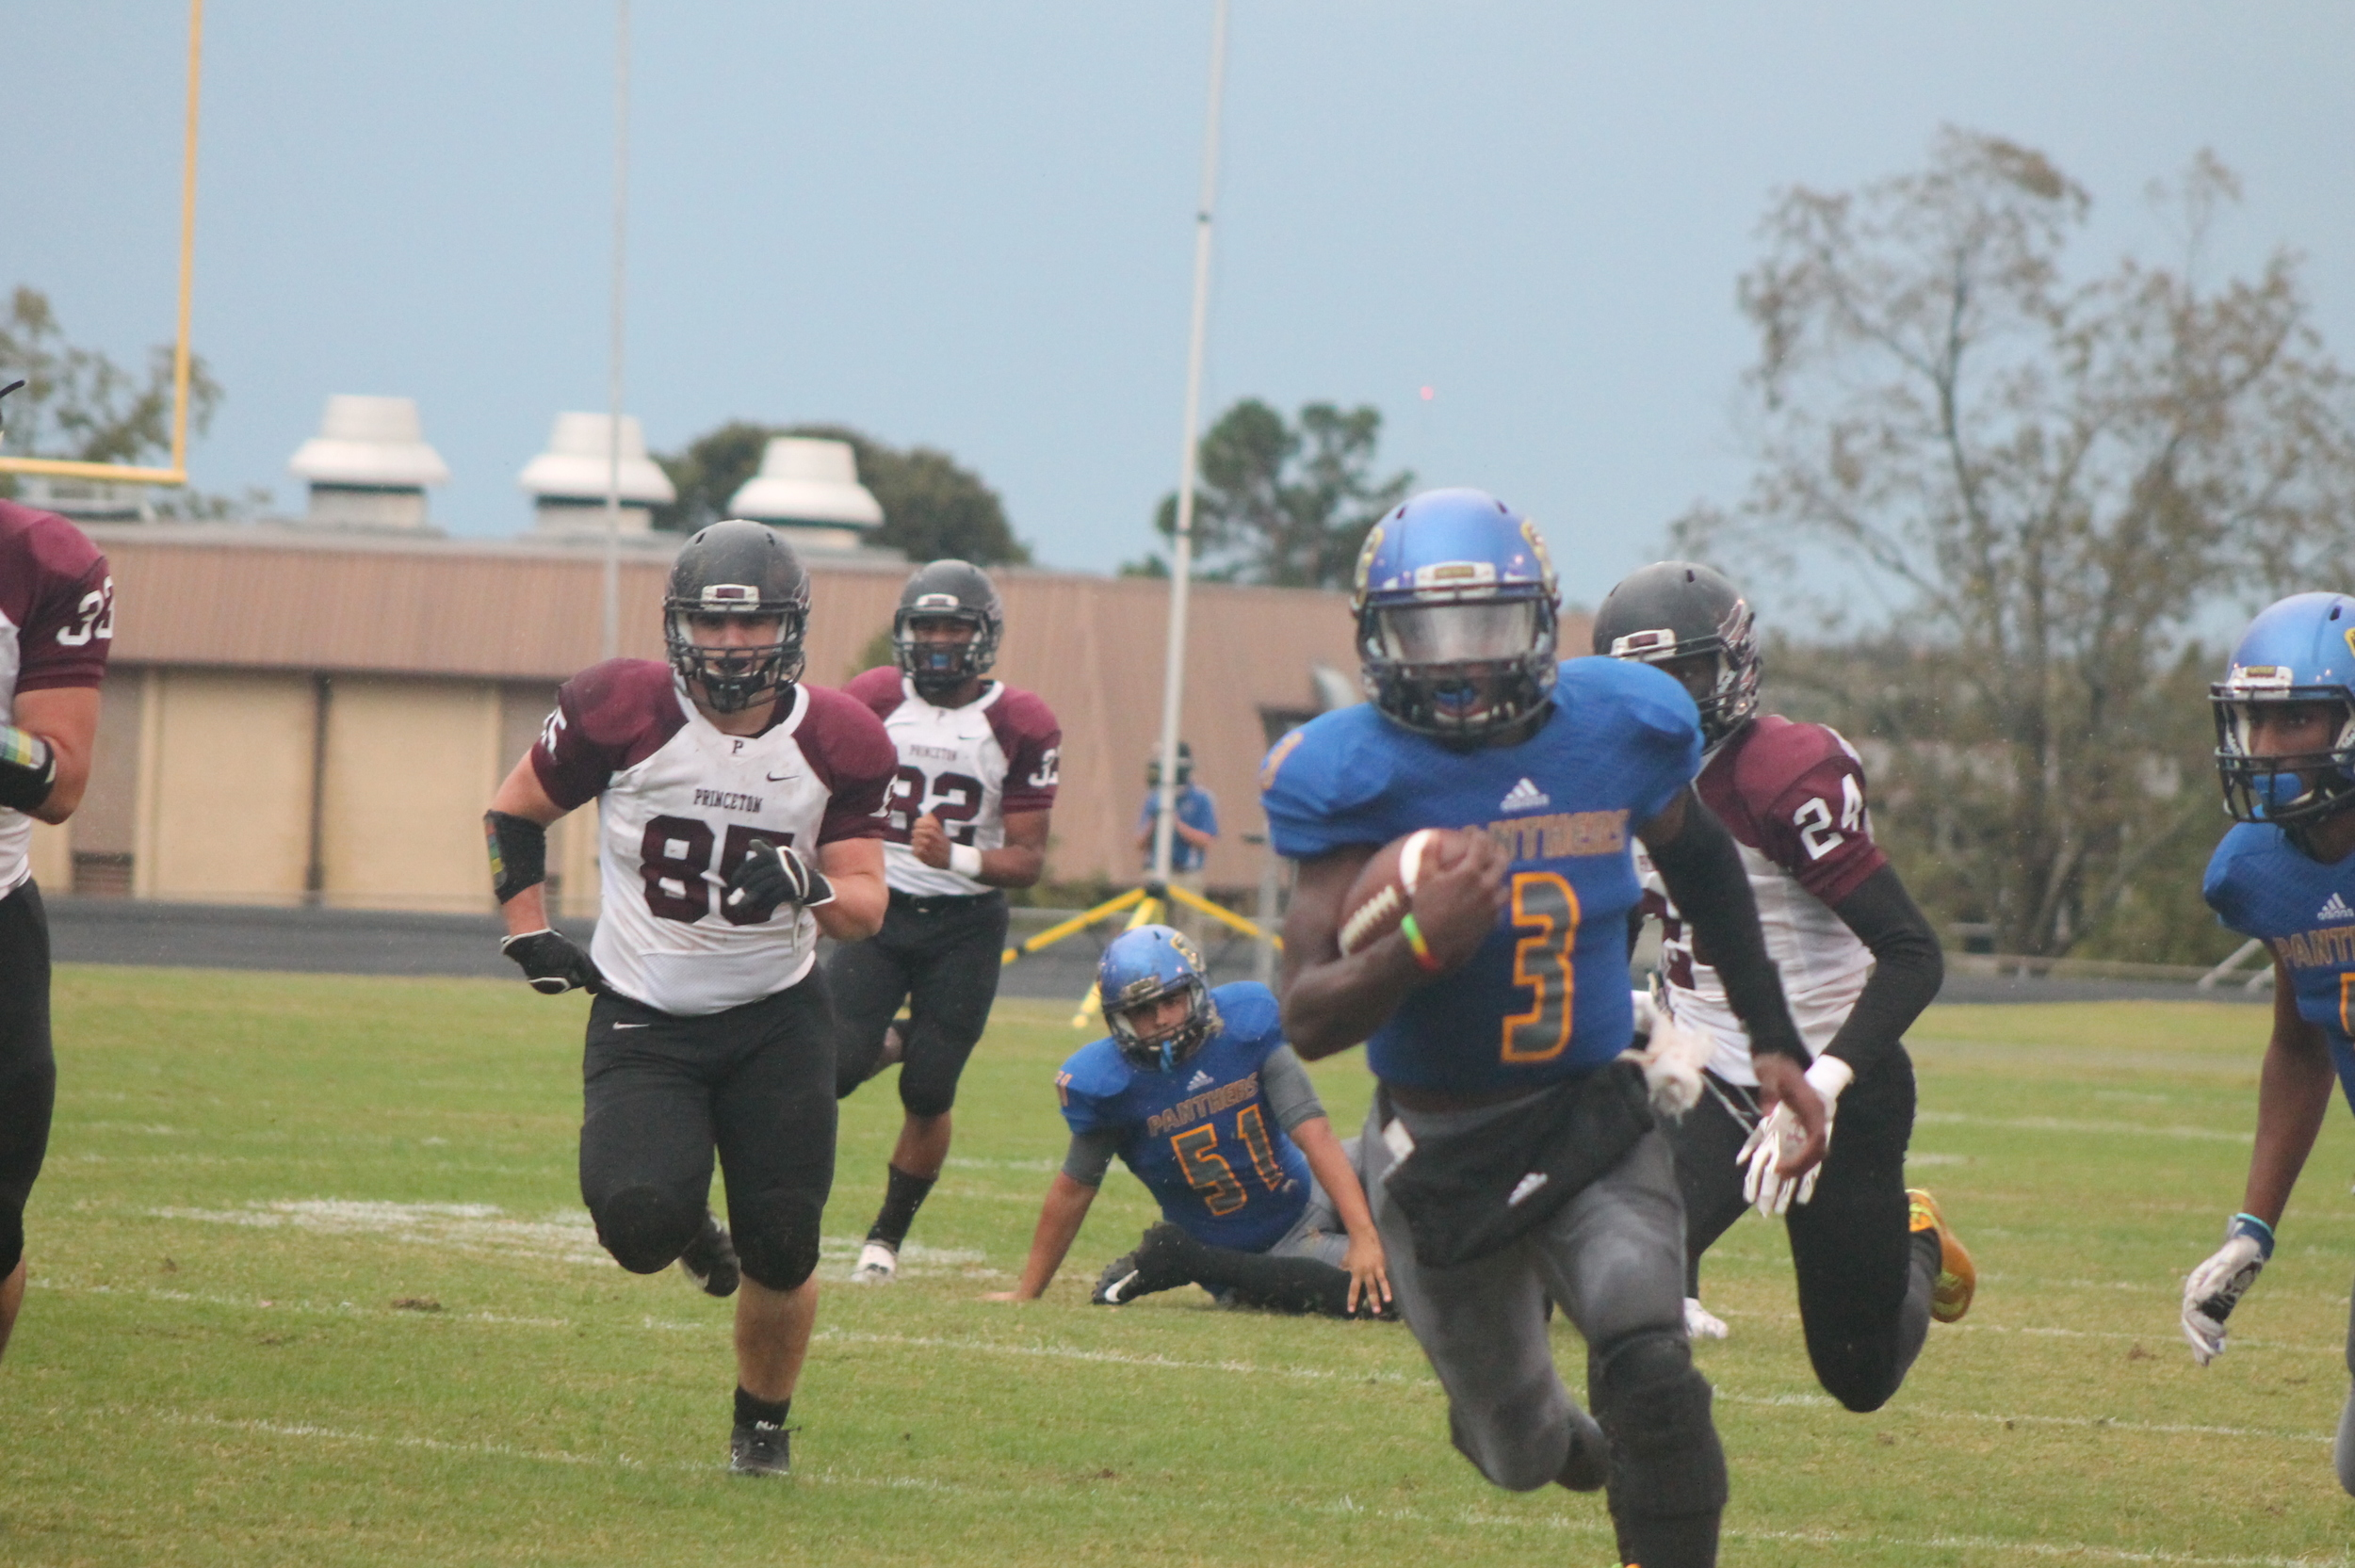 (Photo by Maddy Routon) Versache Buchanan with a touchdown run for North Lamar against Princeton.